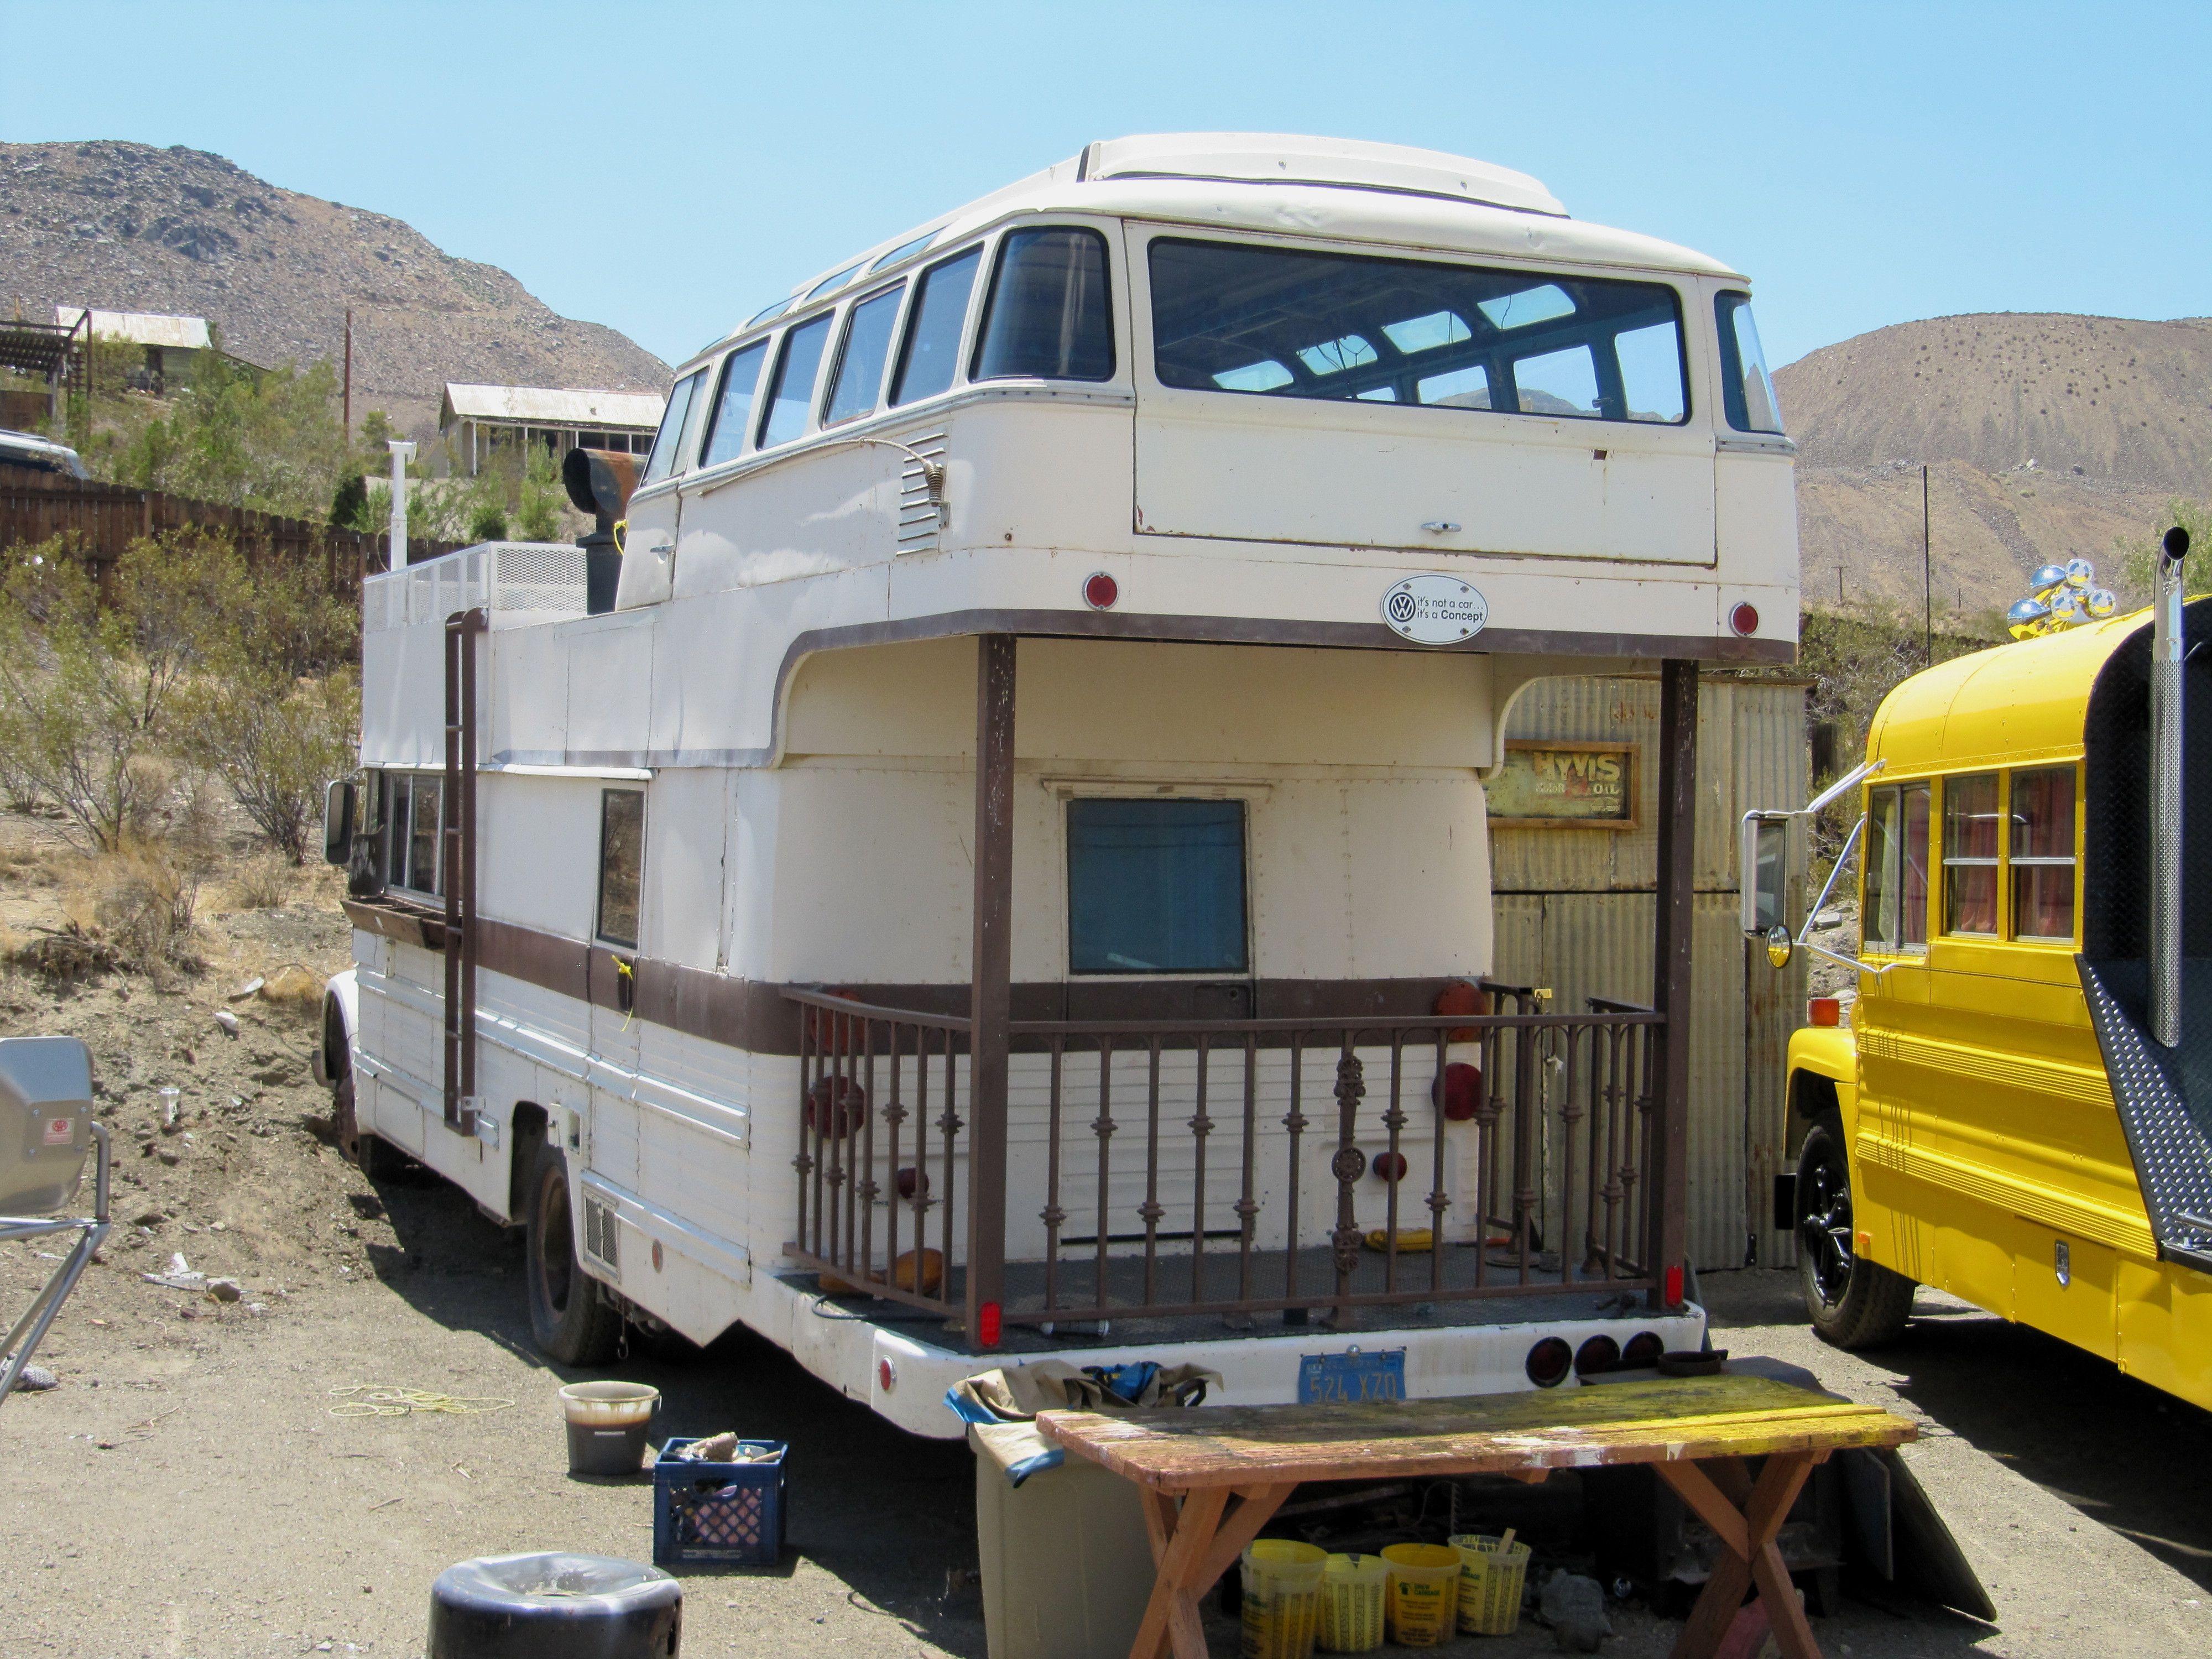 Acacia Rent A Campervan Nz Offers Campervan For Hire -5728